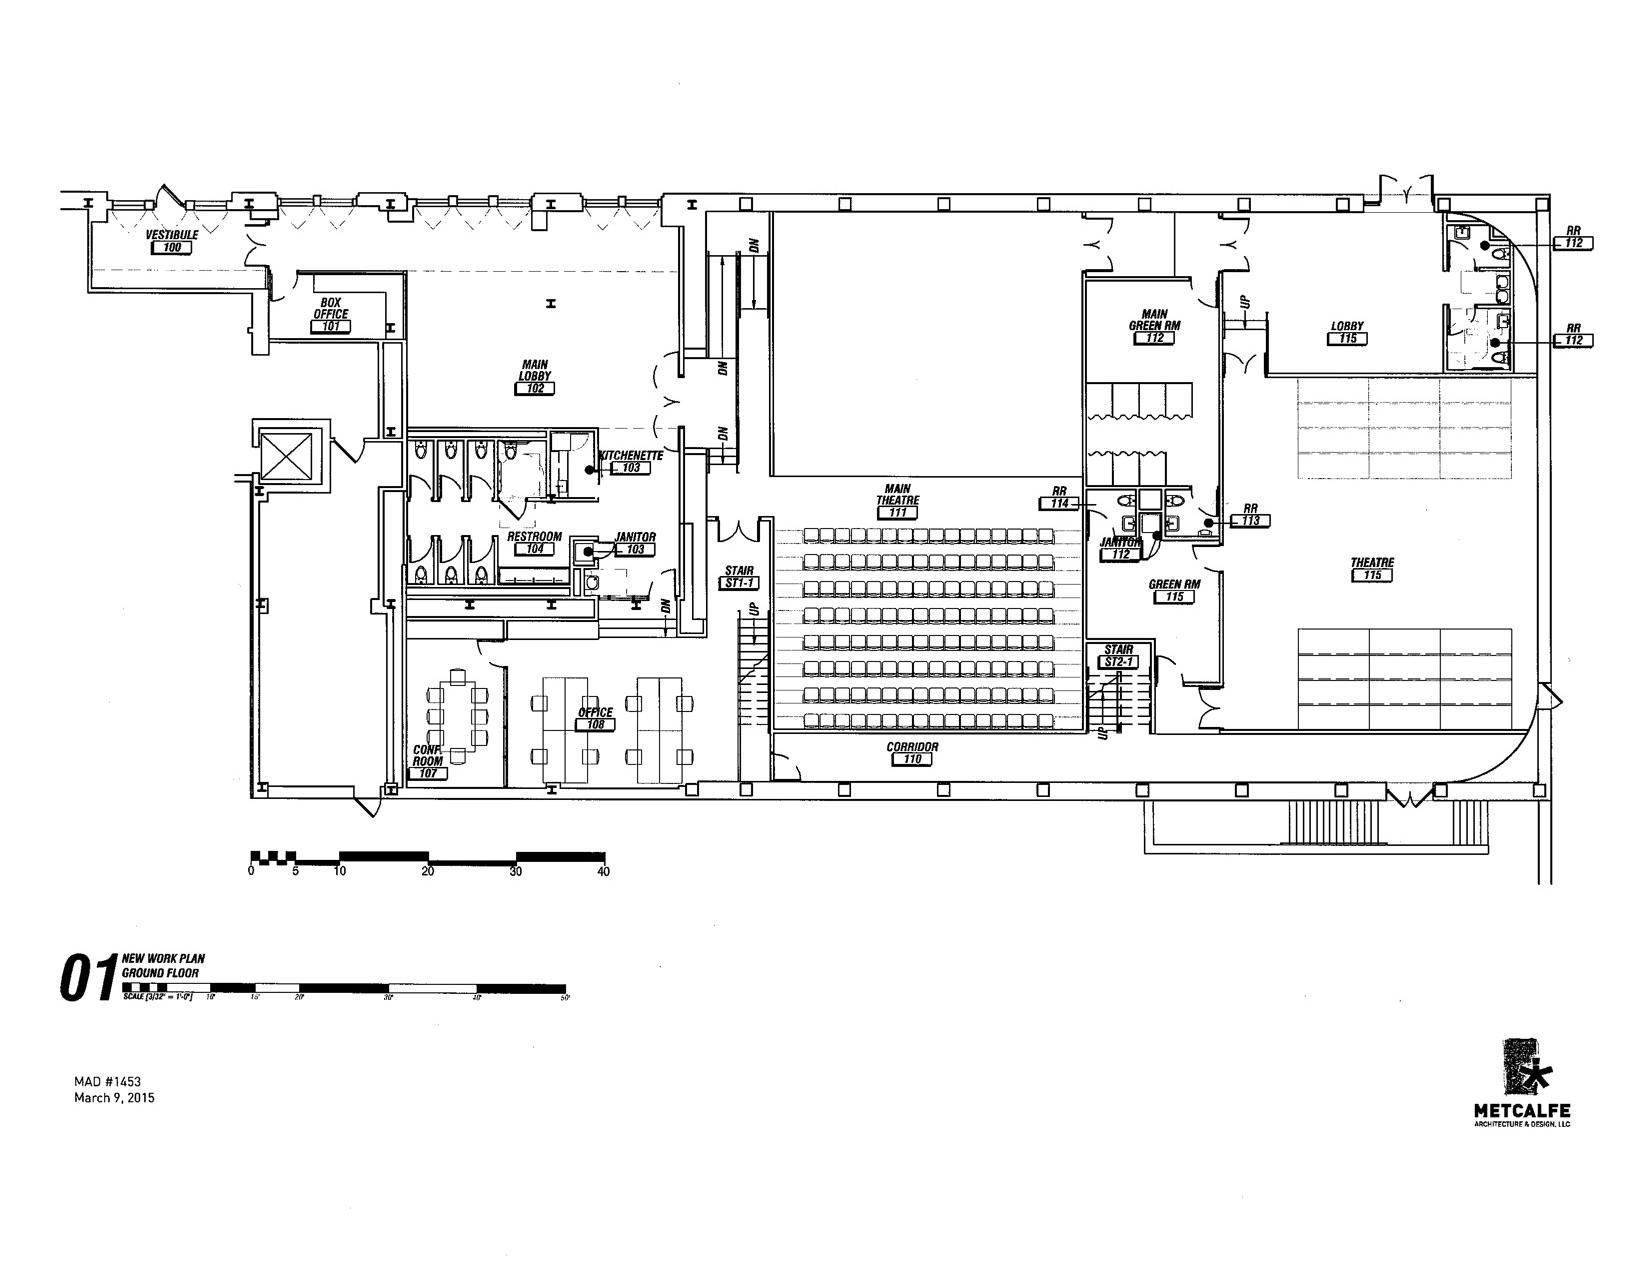 proscenium stage diagram box dei remote start wiring the drake campaign interact theatre company layout march 2015 jpg